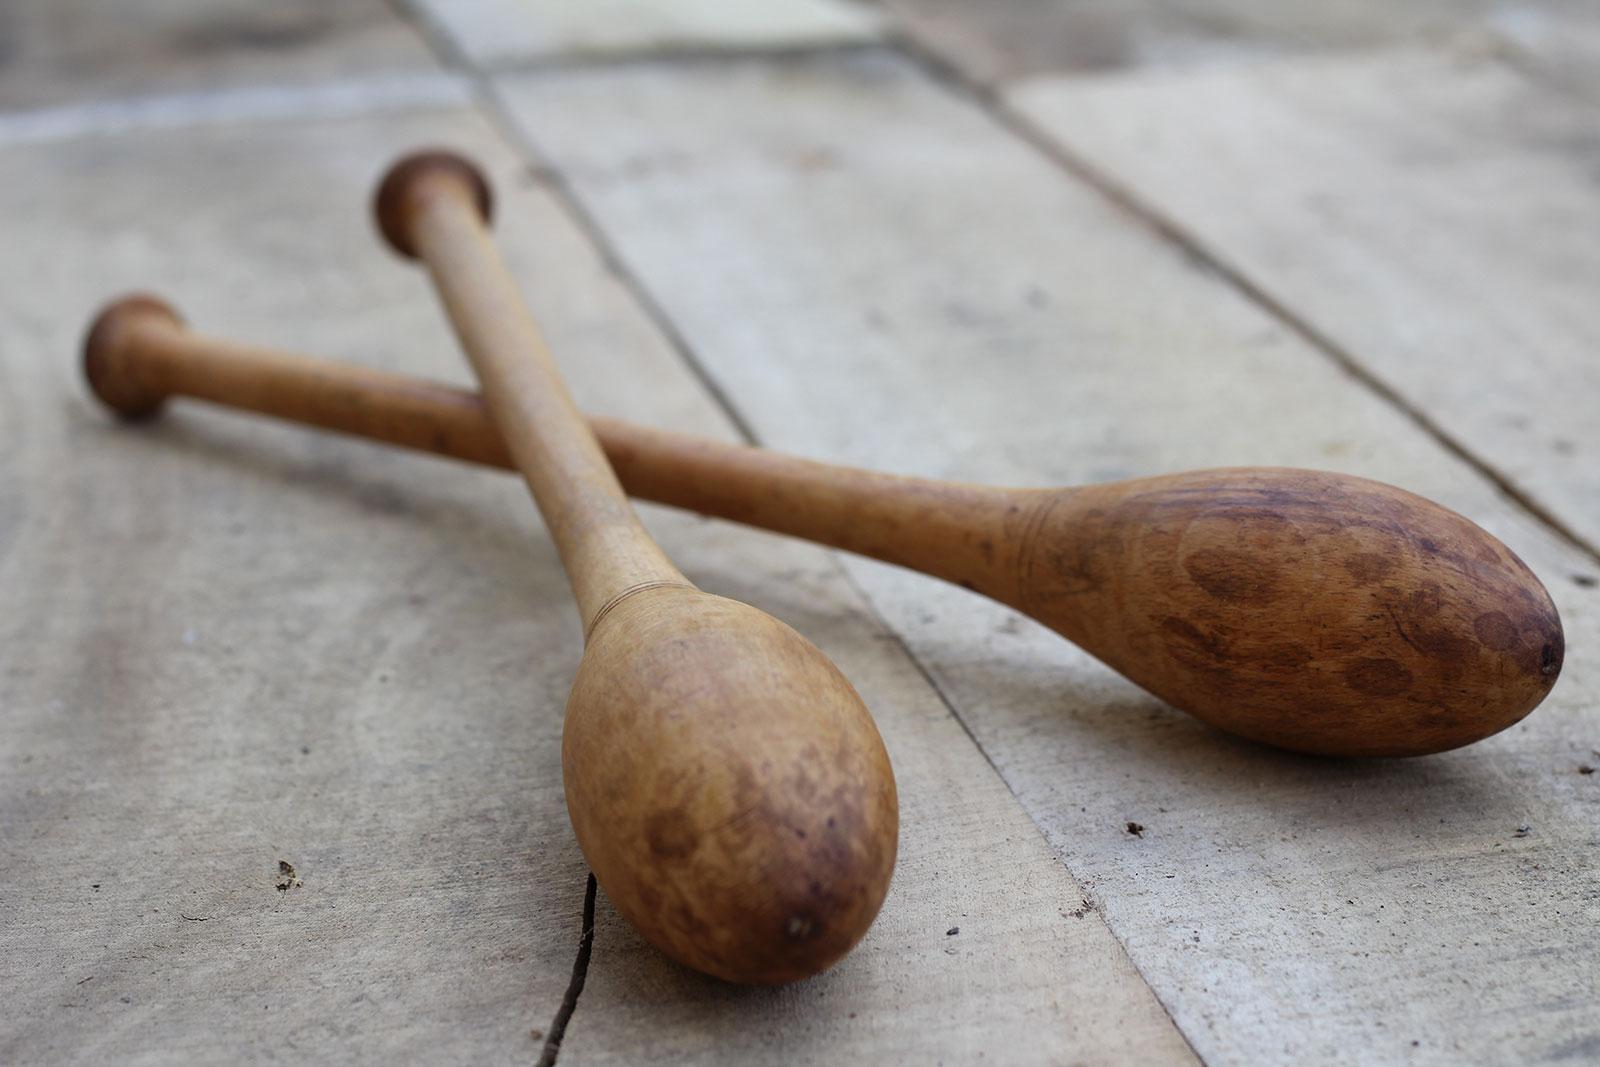 Antique teardrop Indian clubs